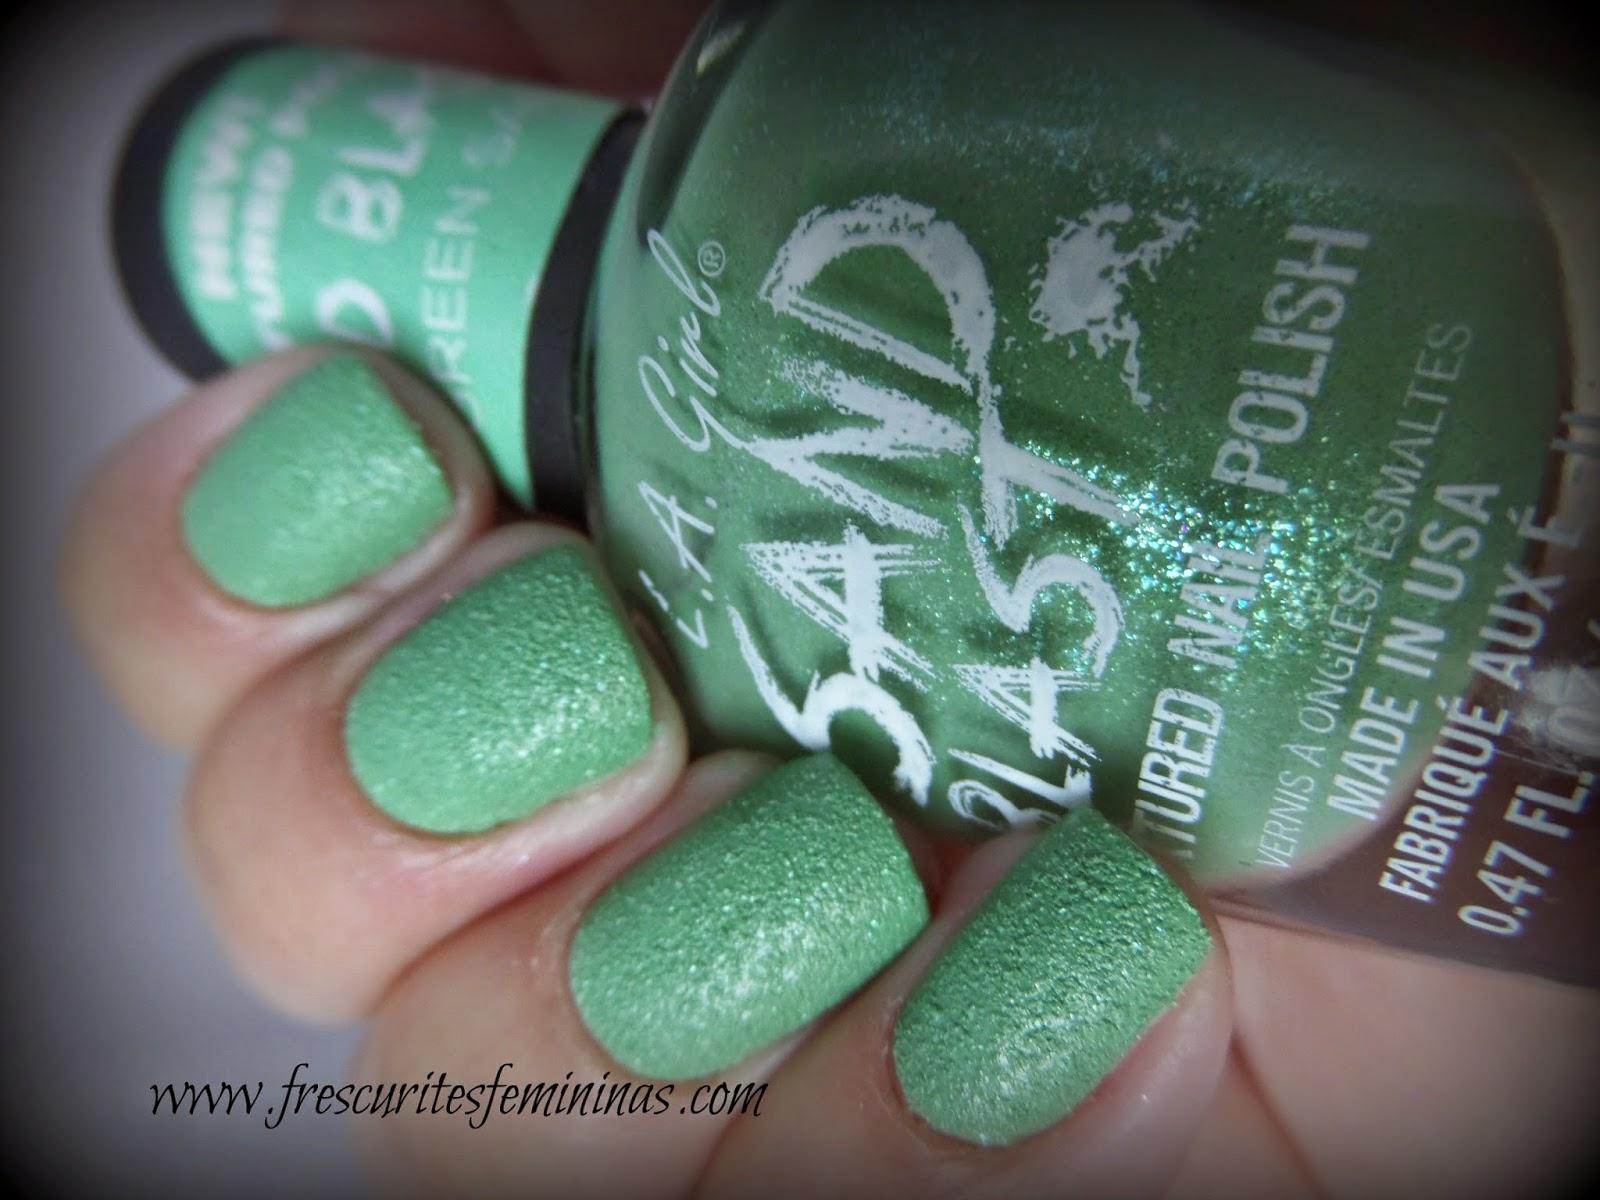 L.A. Girl, Green Sand, Frescurites Femininas, Green nail polish, Esmalte